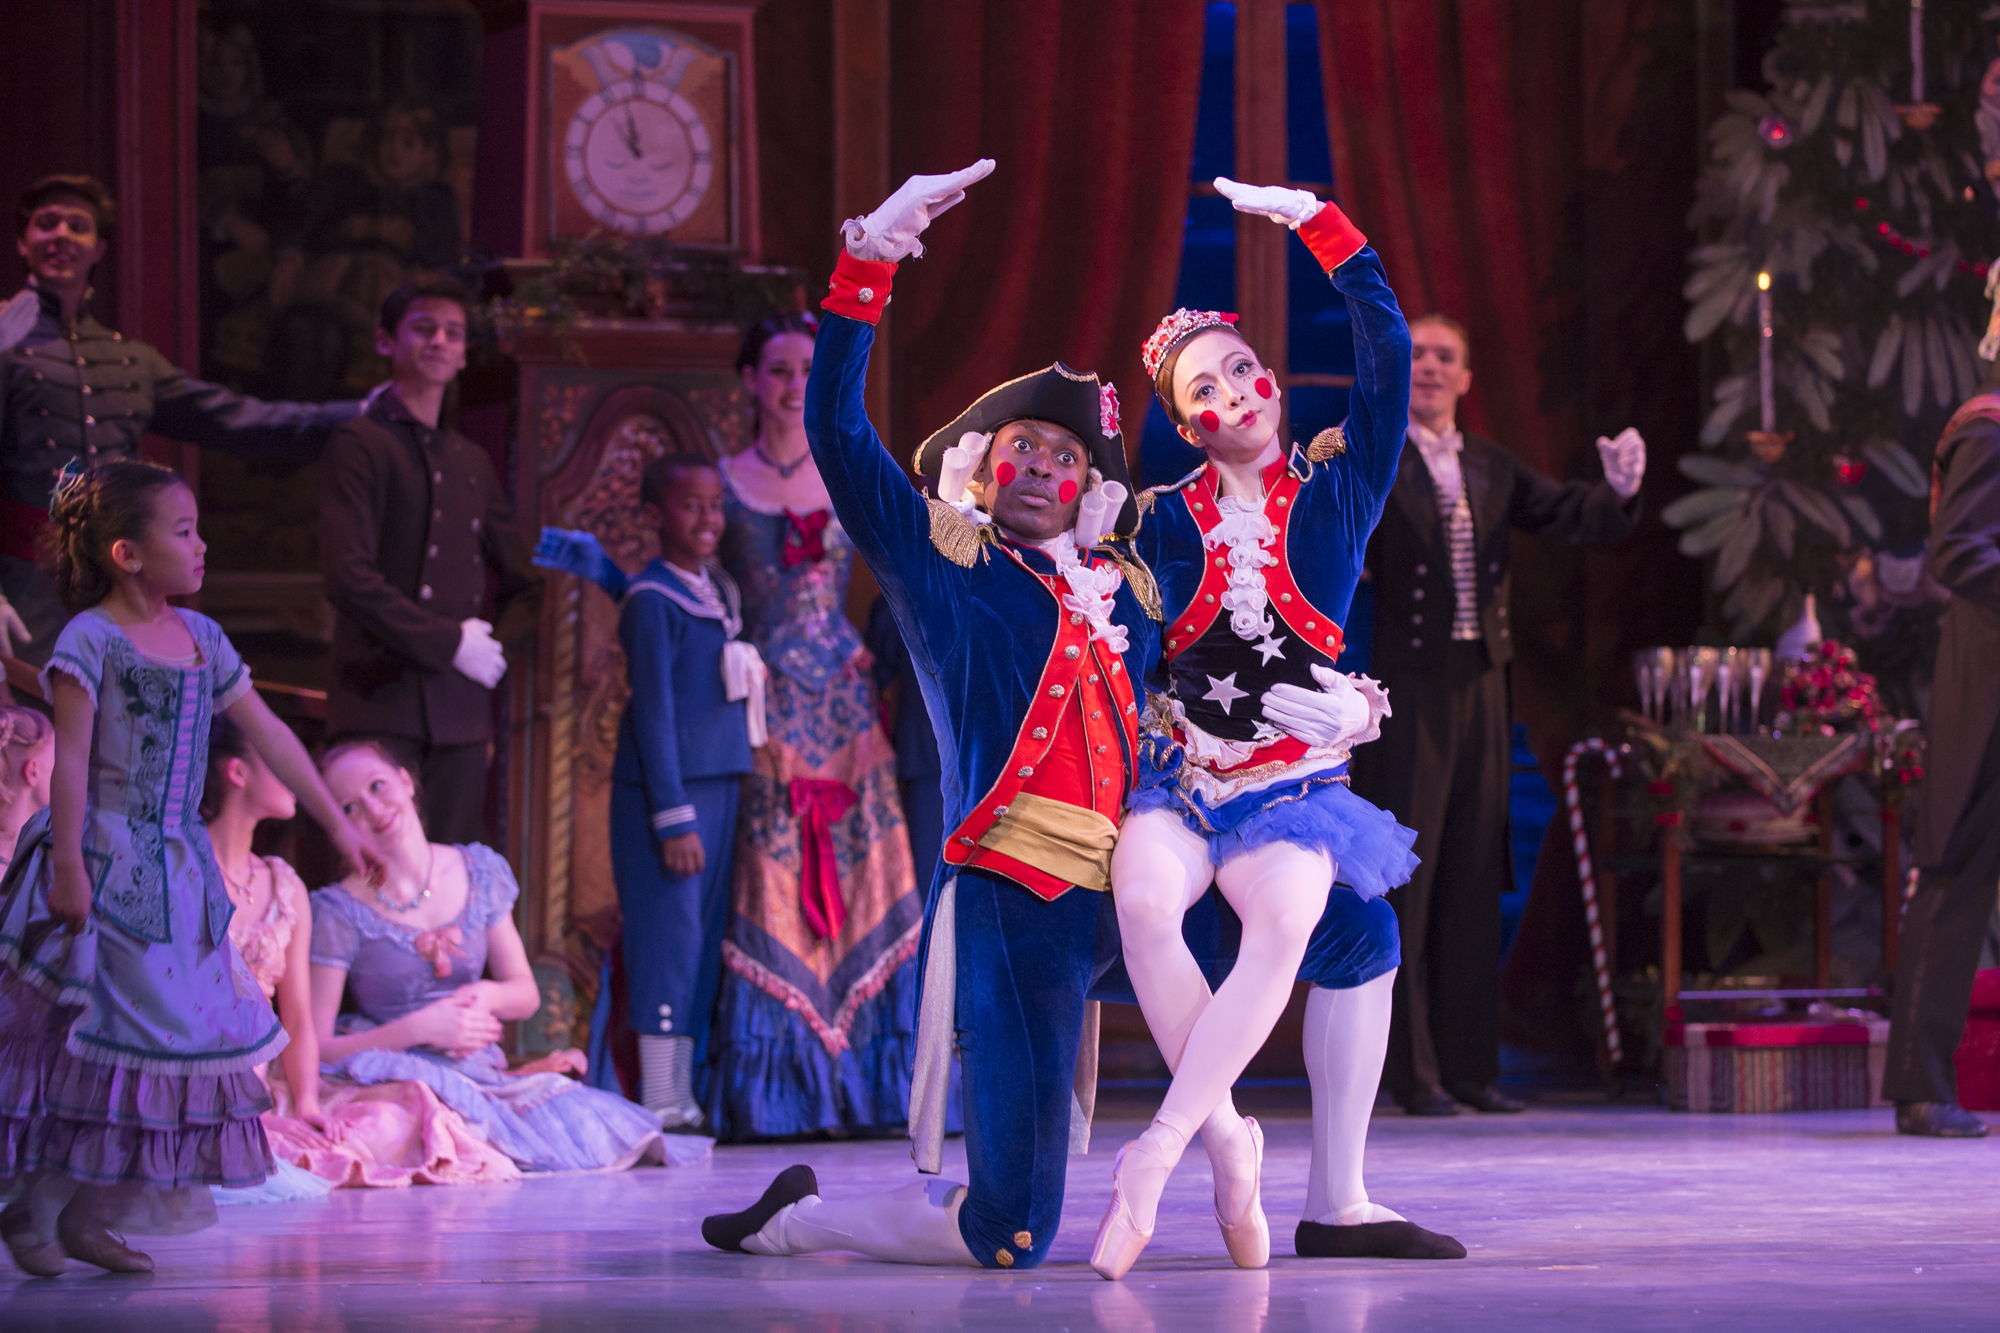 Nutcracker Ballet Returns To Warner Theatre With DC